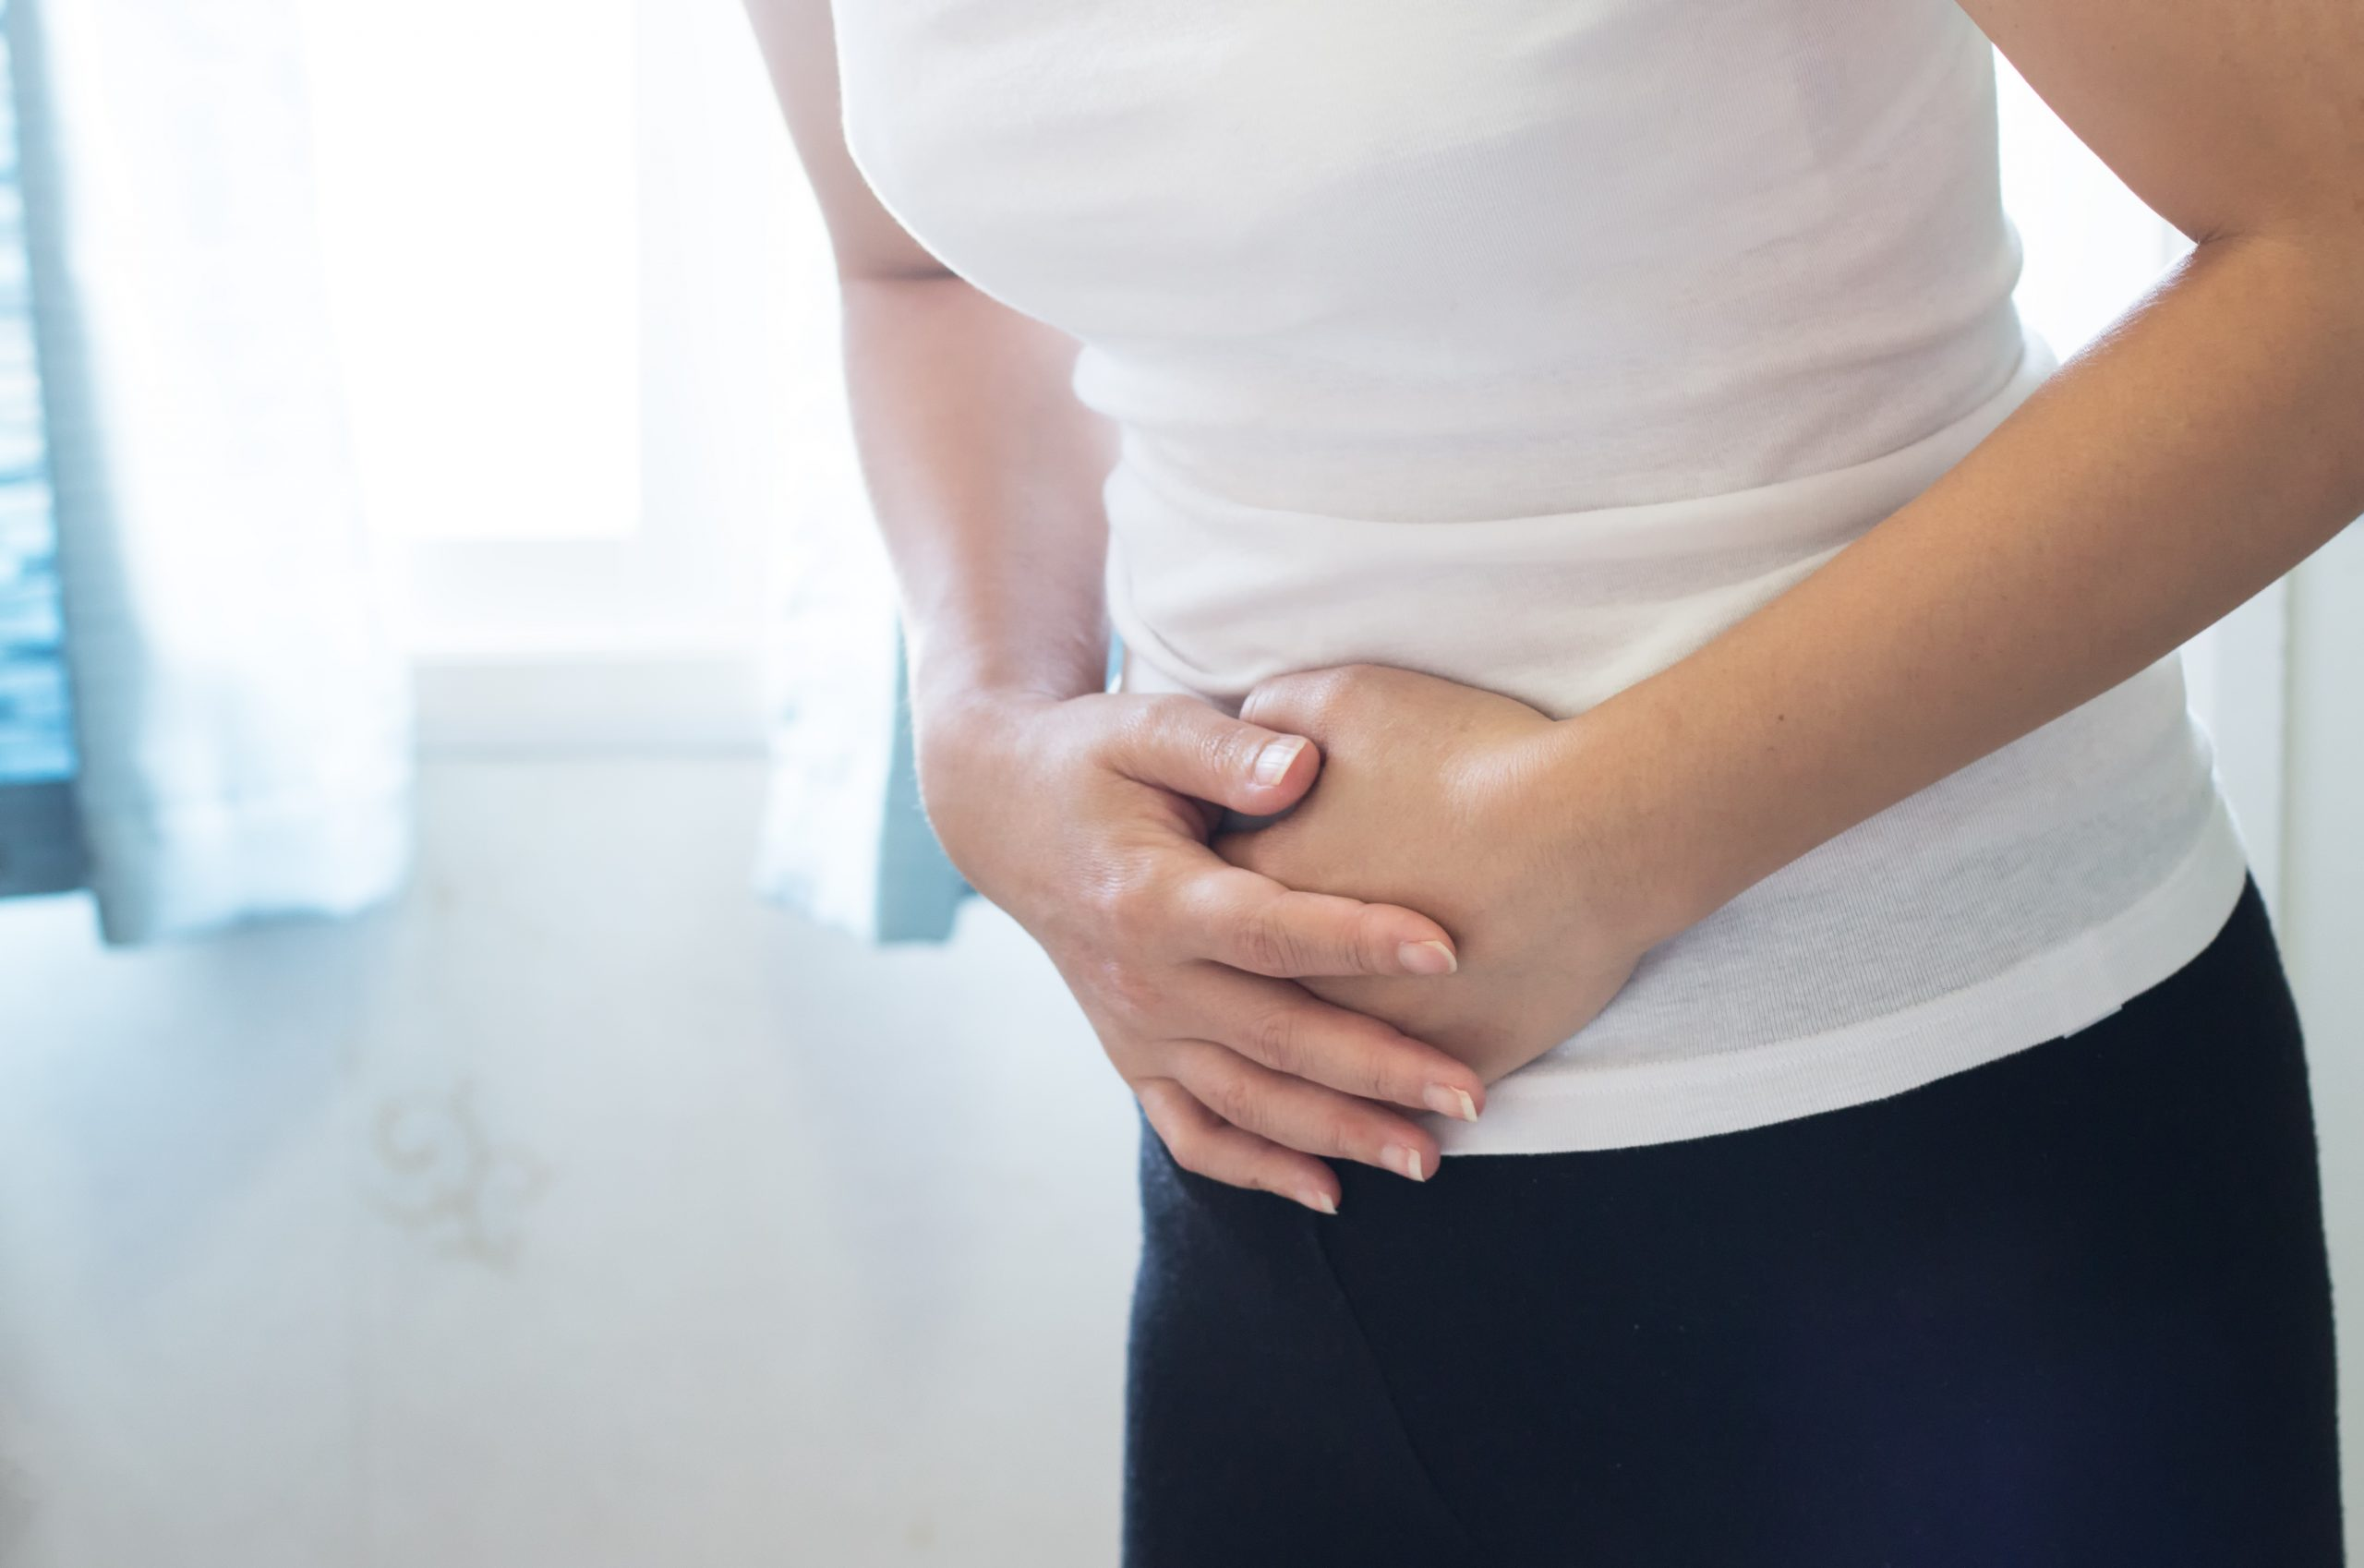 MCTオイルを摂ると腹痛になる?効果的な摂り方と量を知ろう!